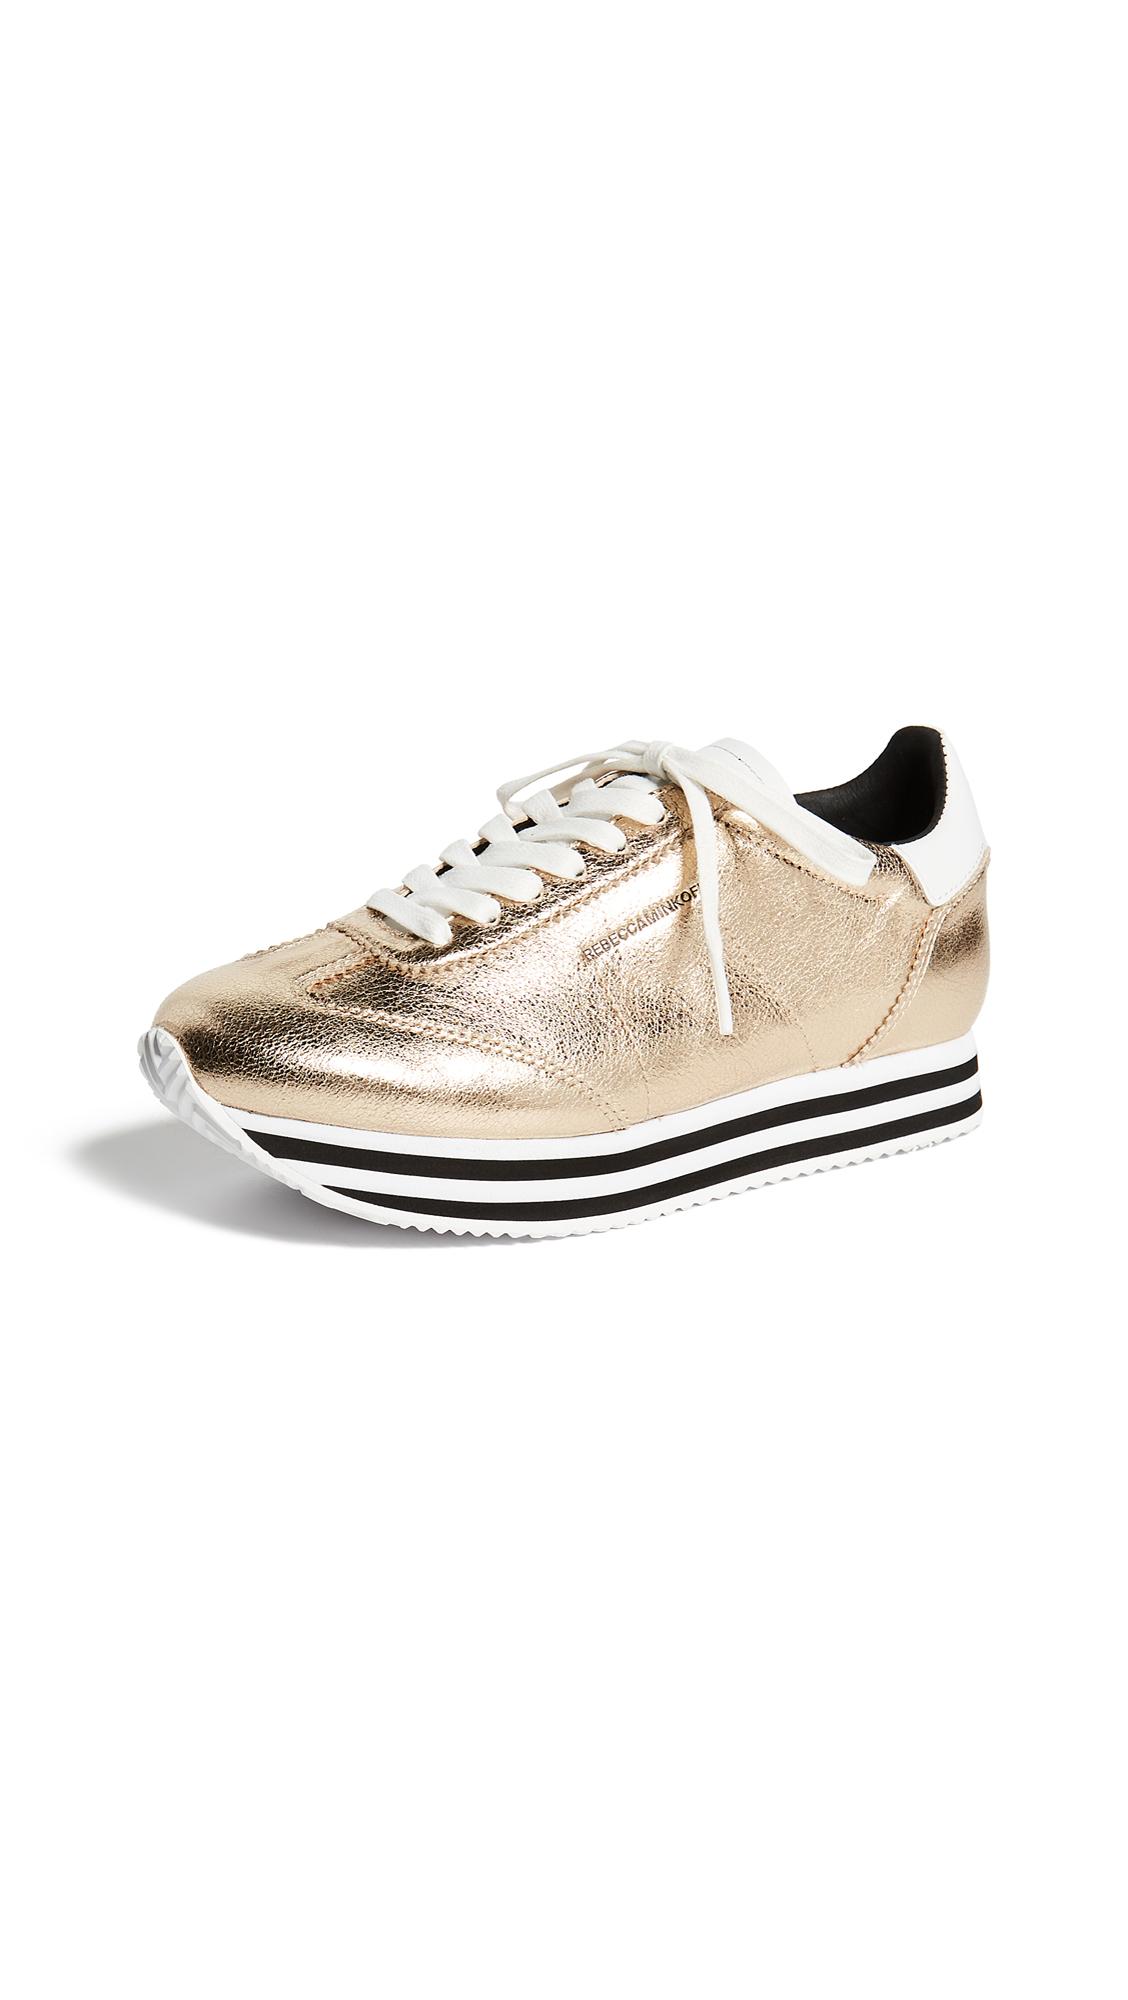 Rebecca Minkoff Susanna Sneakers - Gold